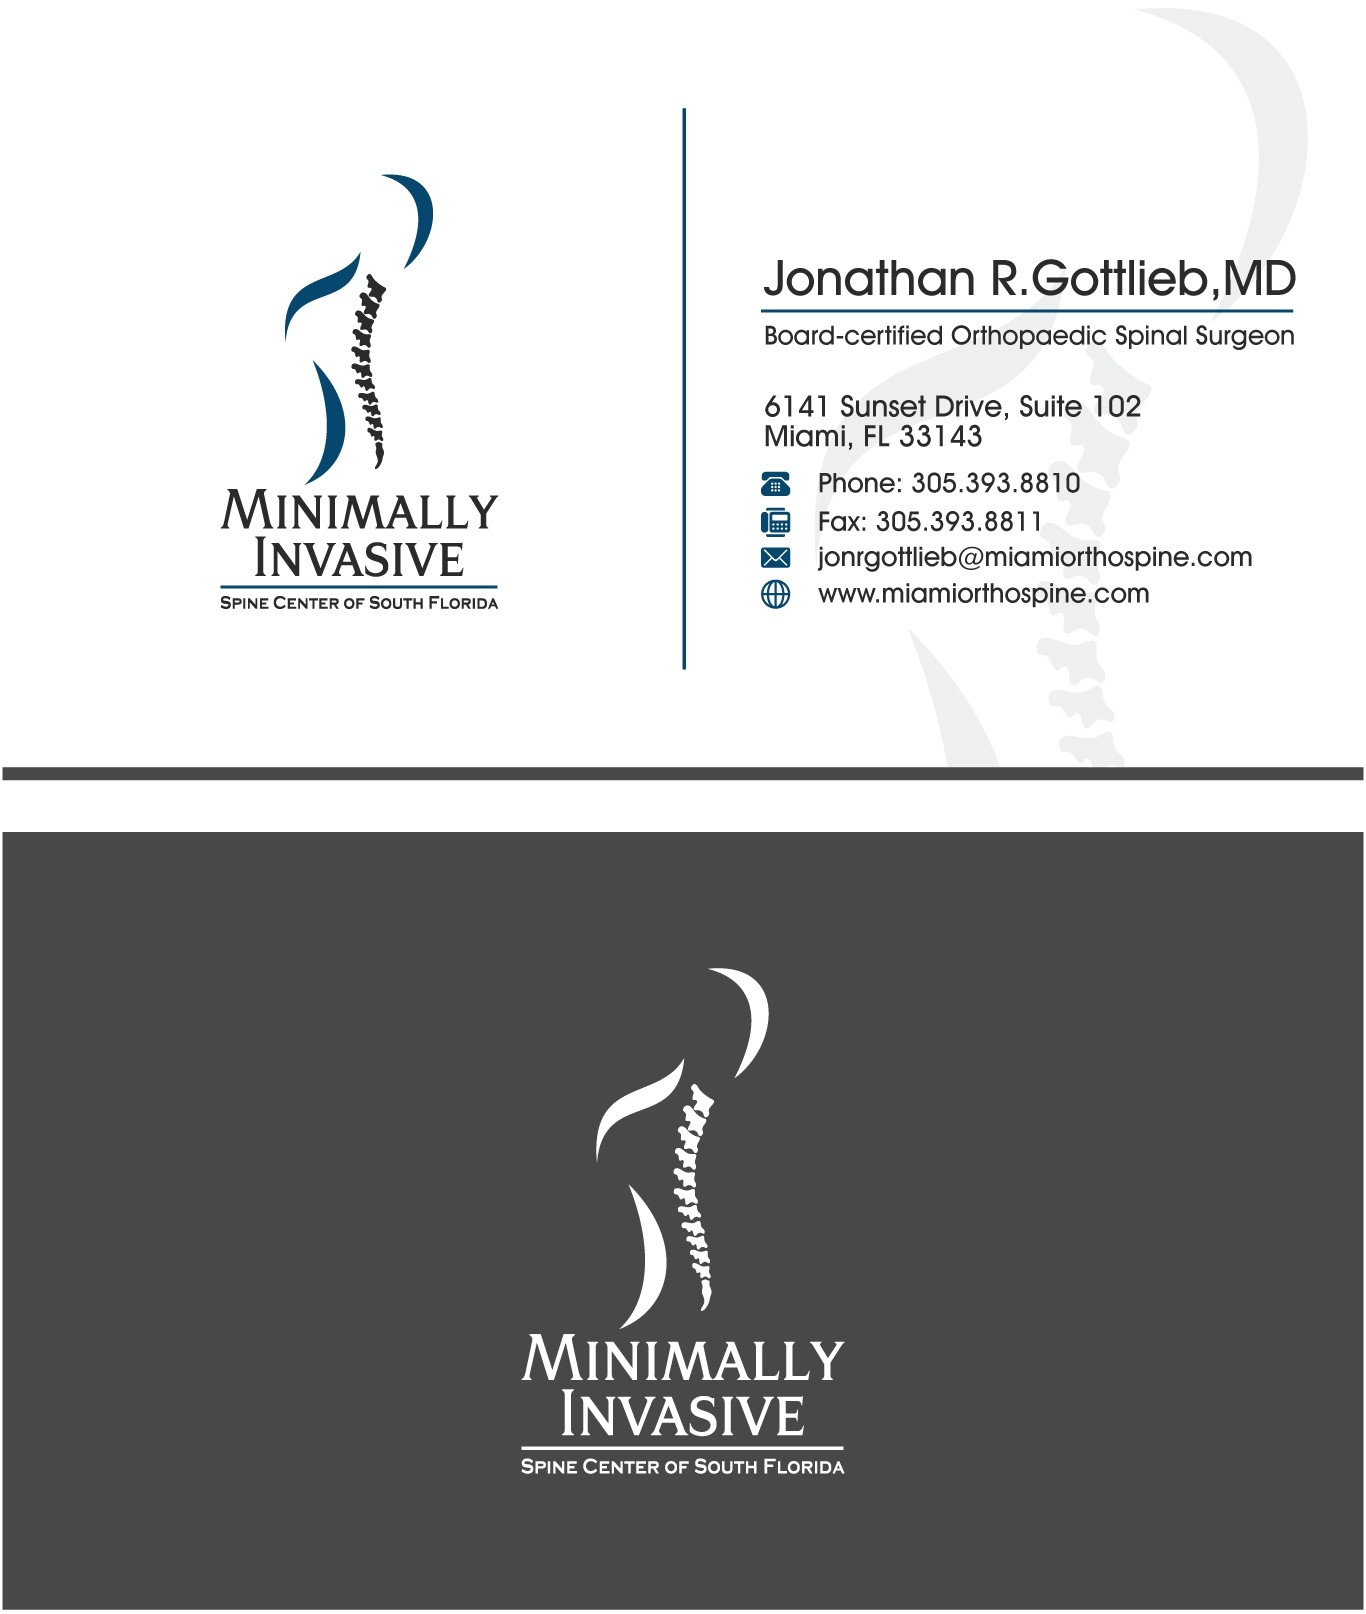 business card minimally invasive